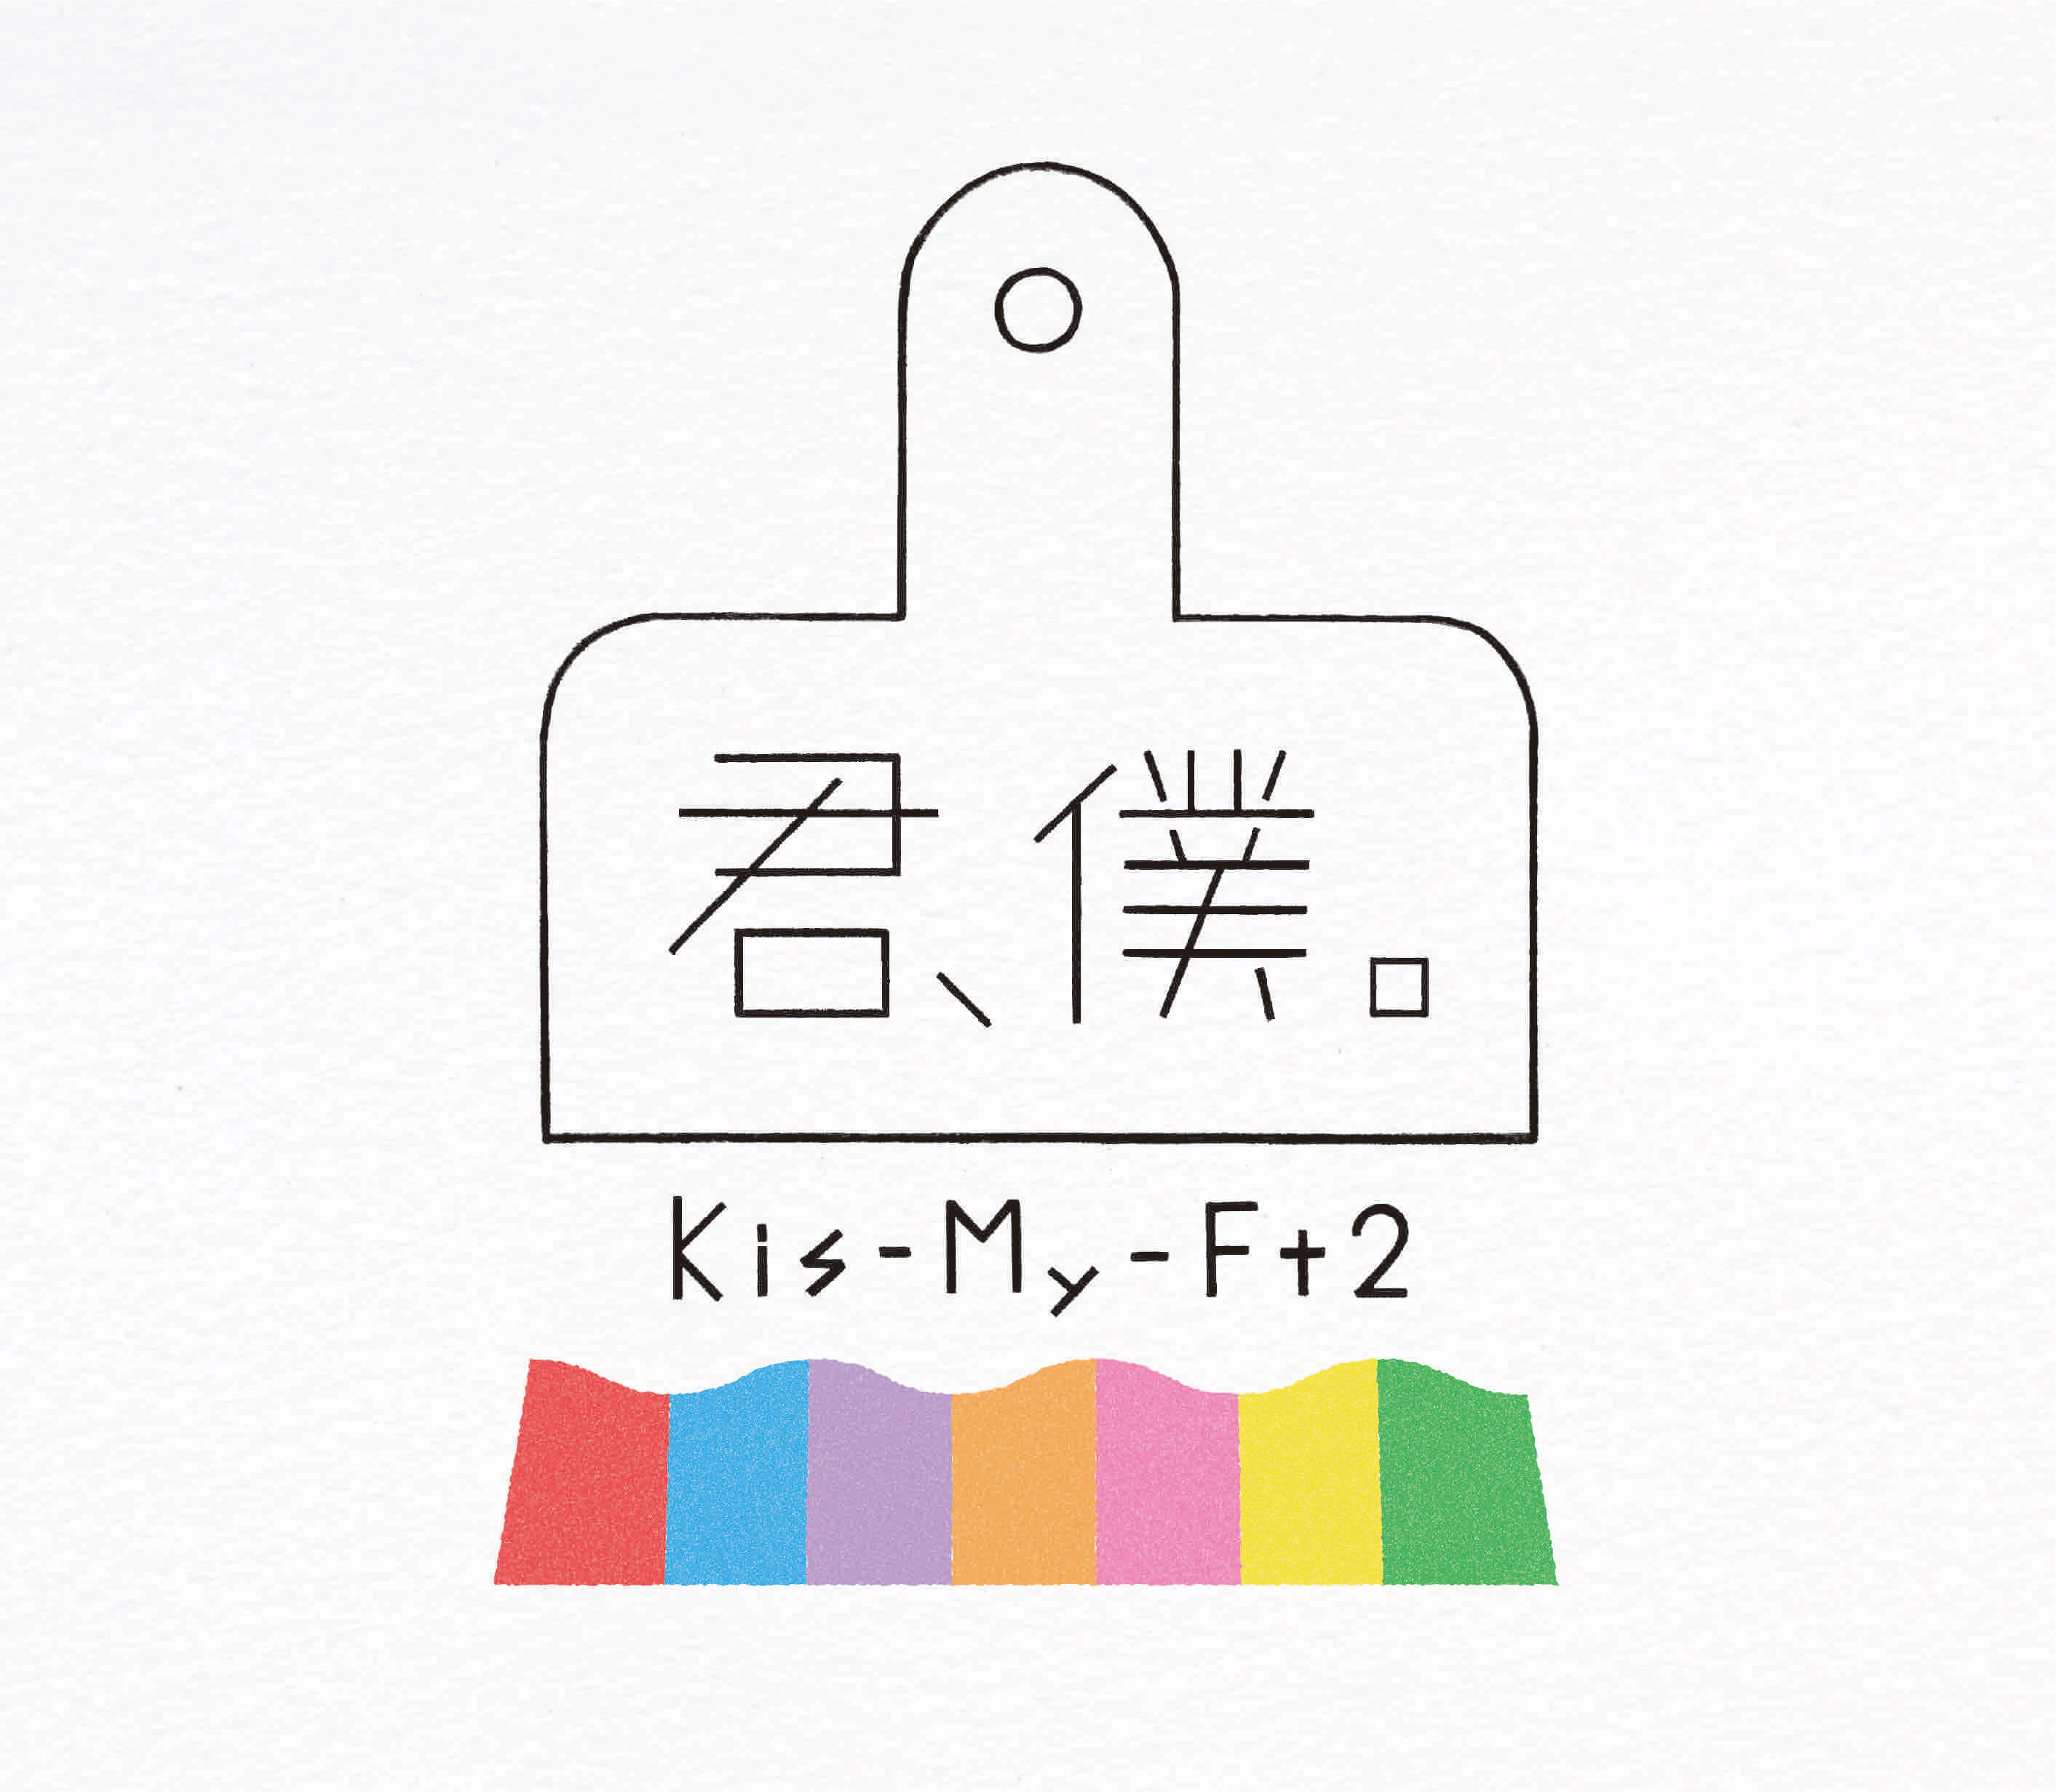 kis-my-ft2_%e5%90%9b%e3%80%81%e5%83%95%e3%80%82%e5%88%9d%e5%9b%9e%e7%9b%a4_a-2